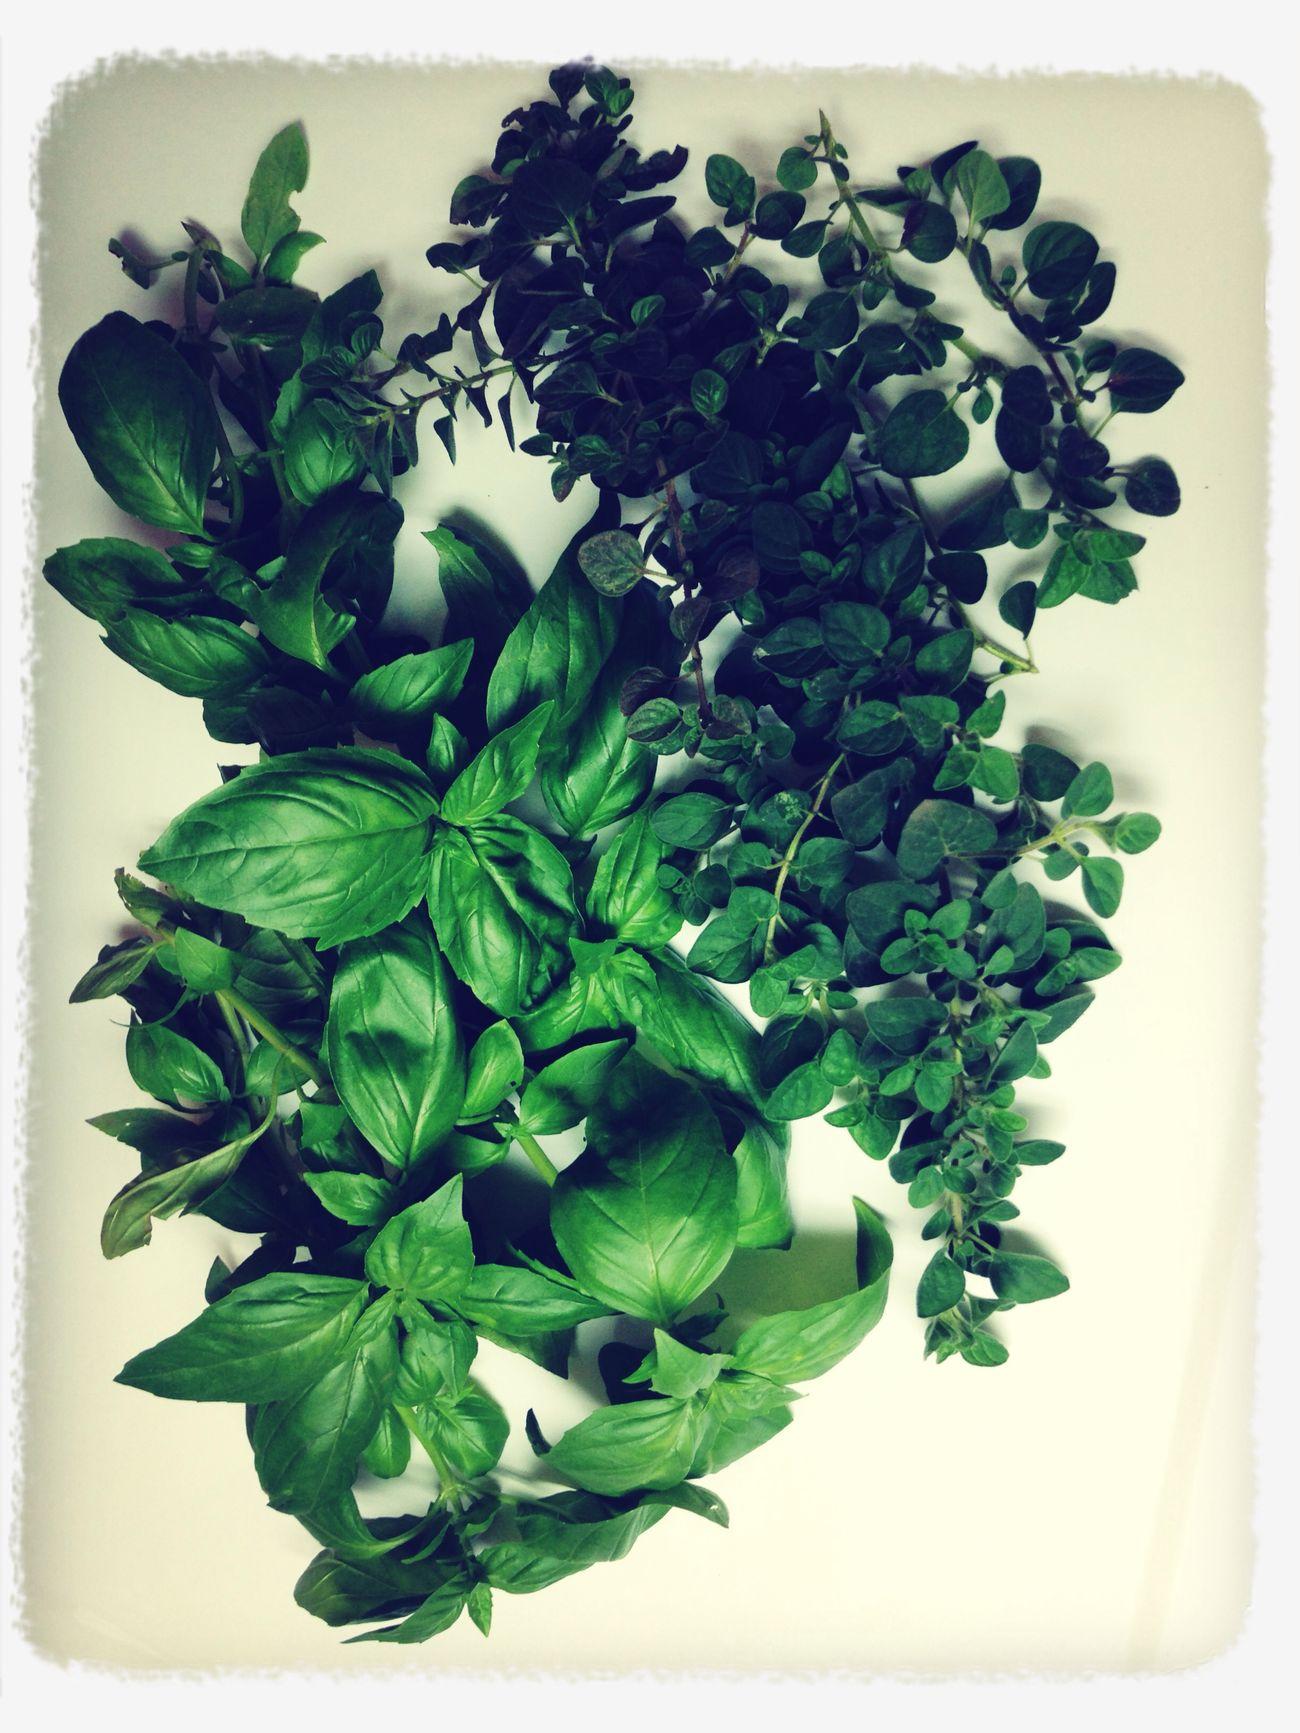 Flowers,Plants & Garden Herbs H E R B A L I S T. Natural Beauty